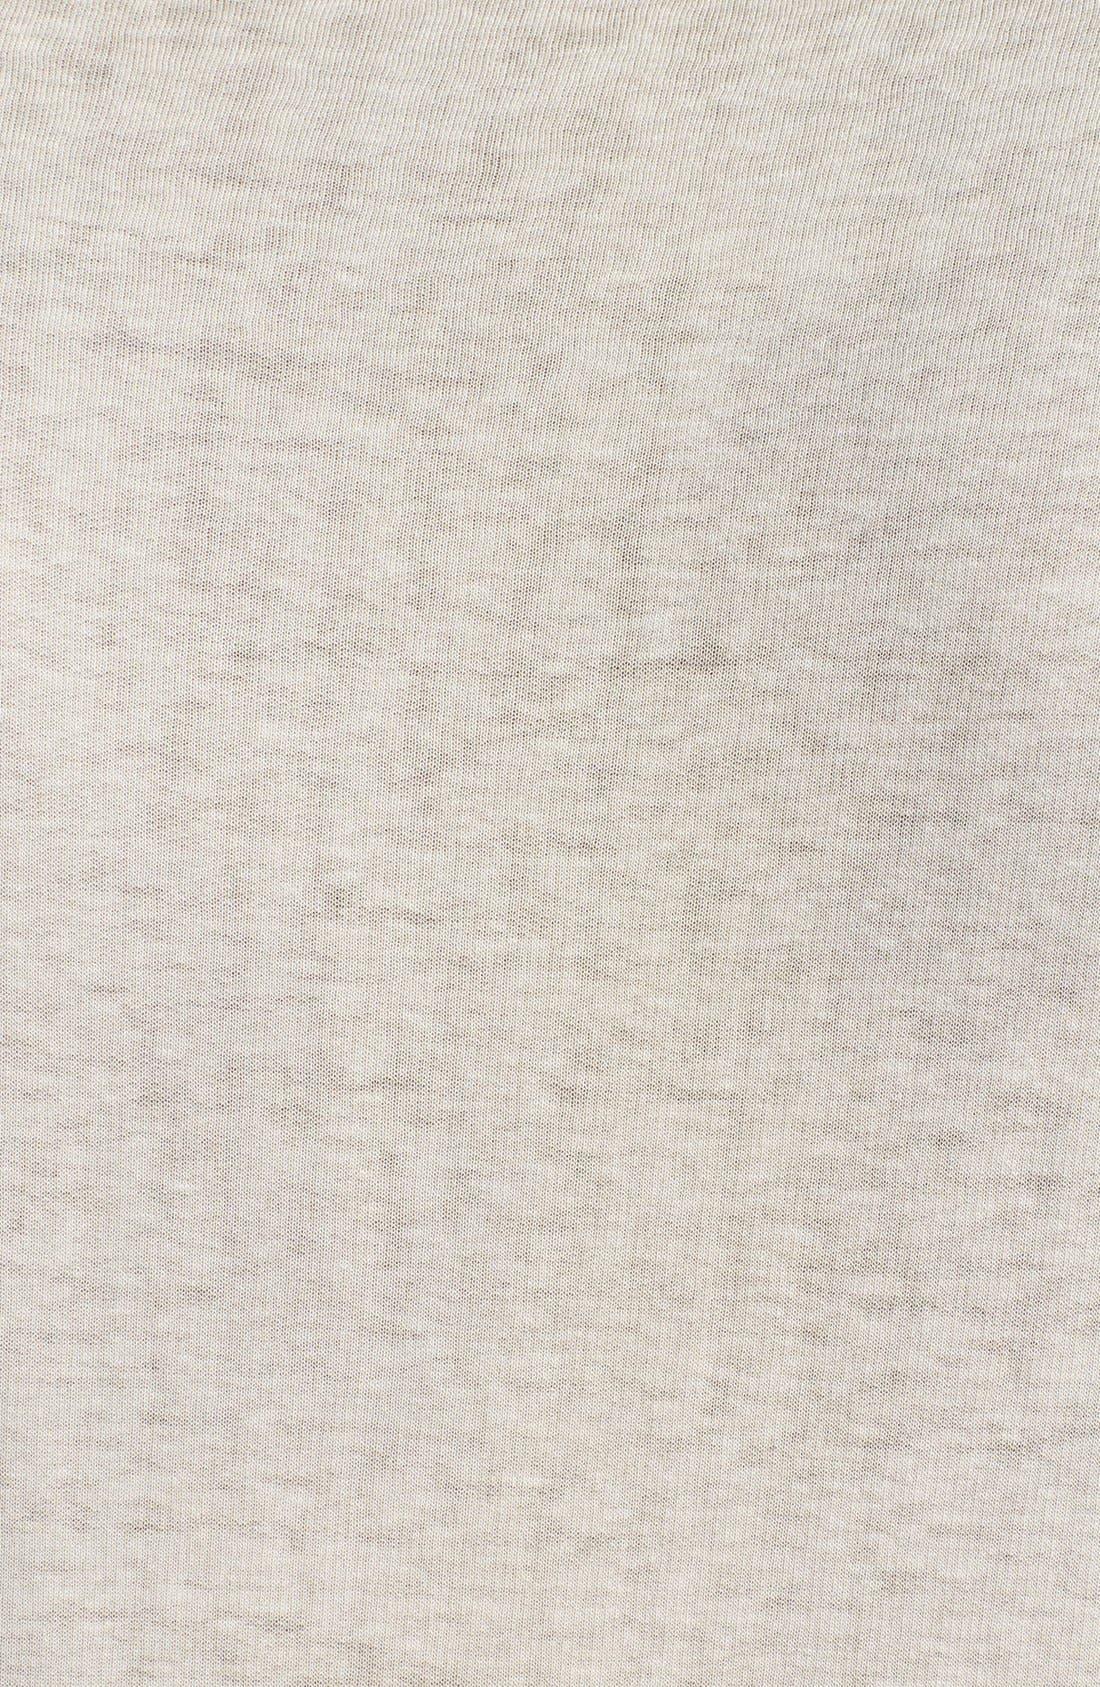 Washed Raglan Sleeve Sweatshirt,                             Alternate thumbnail 16, color,